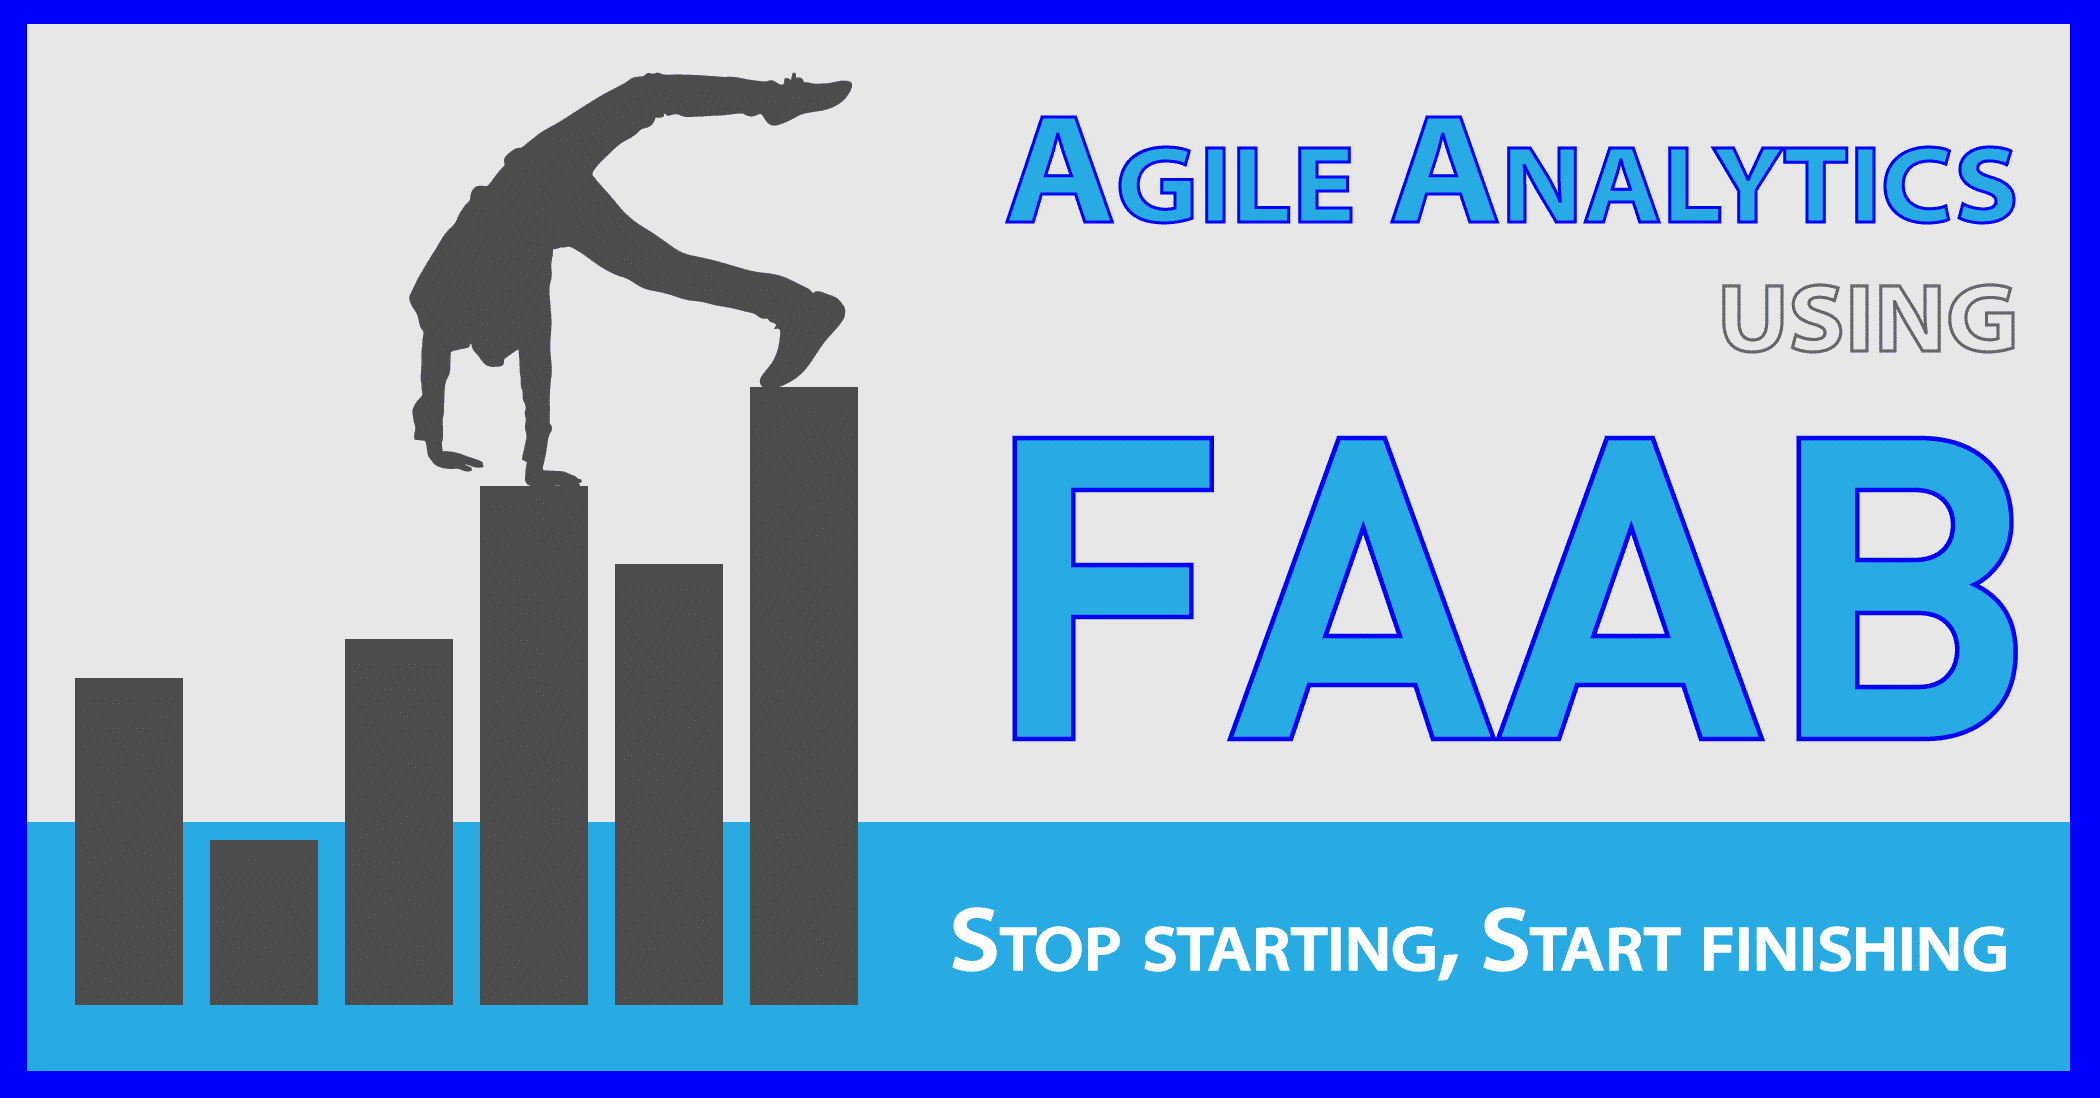 Flexible Agile Analytics for Business